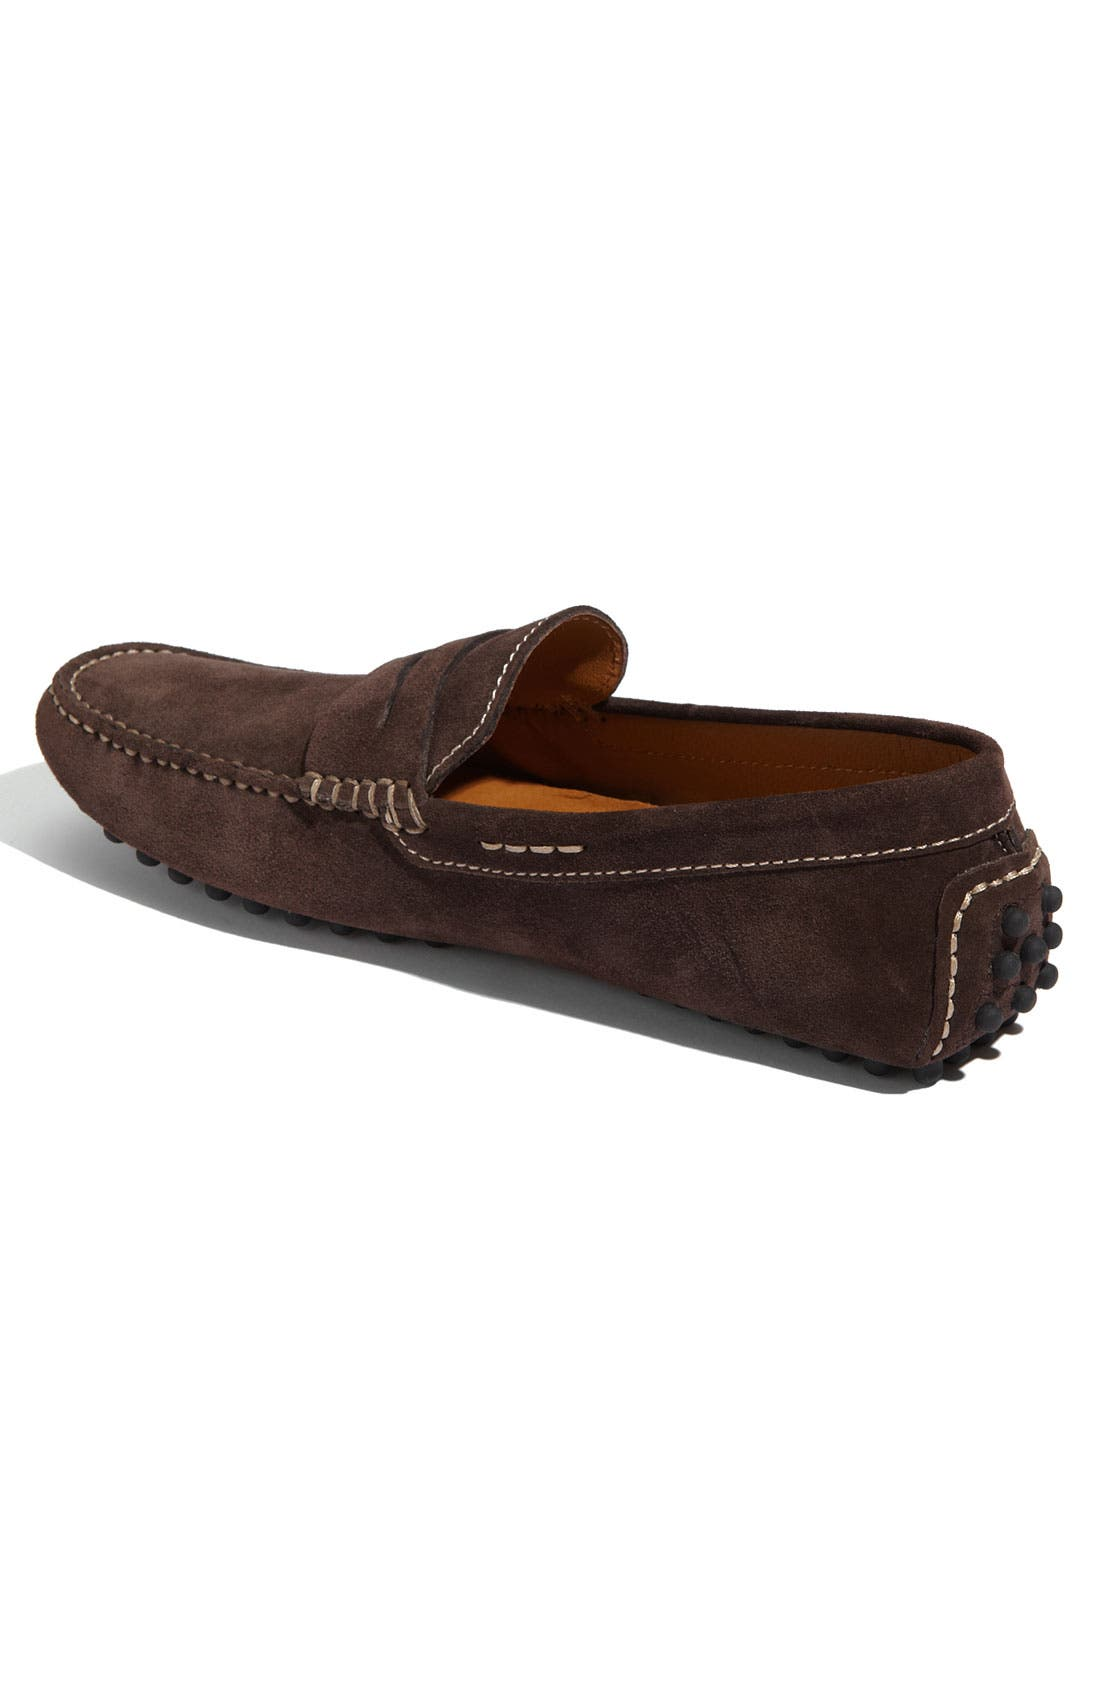 'Tobago' Driving Shoe,                             Alternate thumbnail 2, color,                             Brown